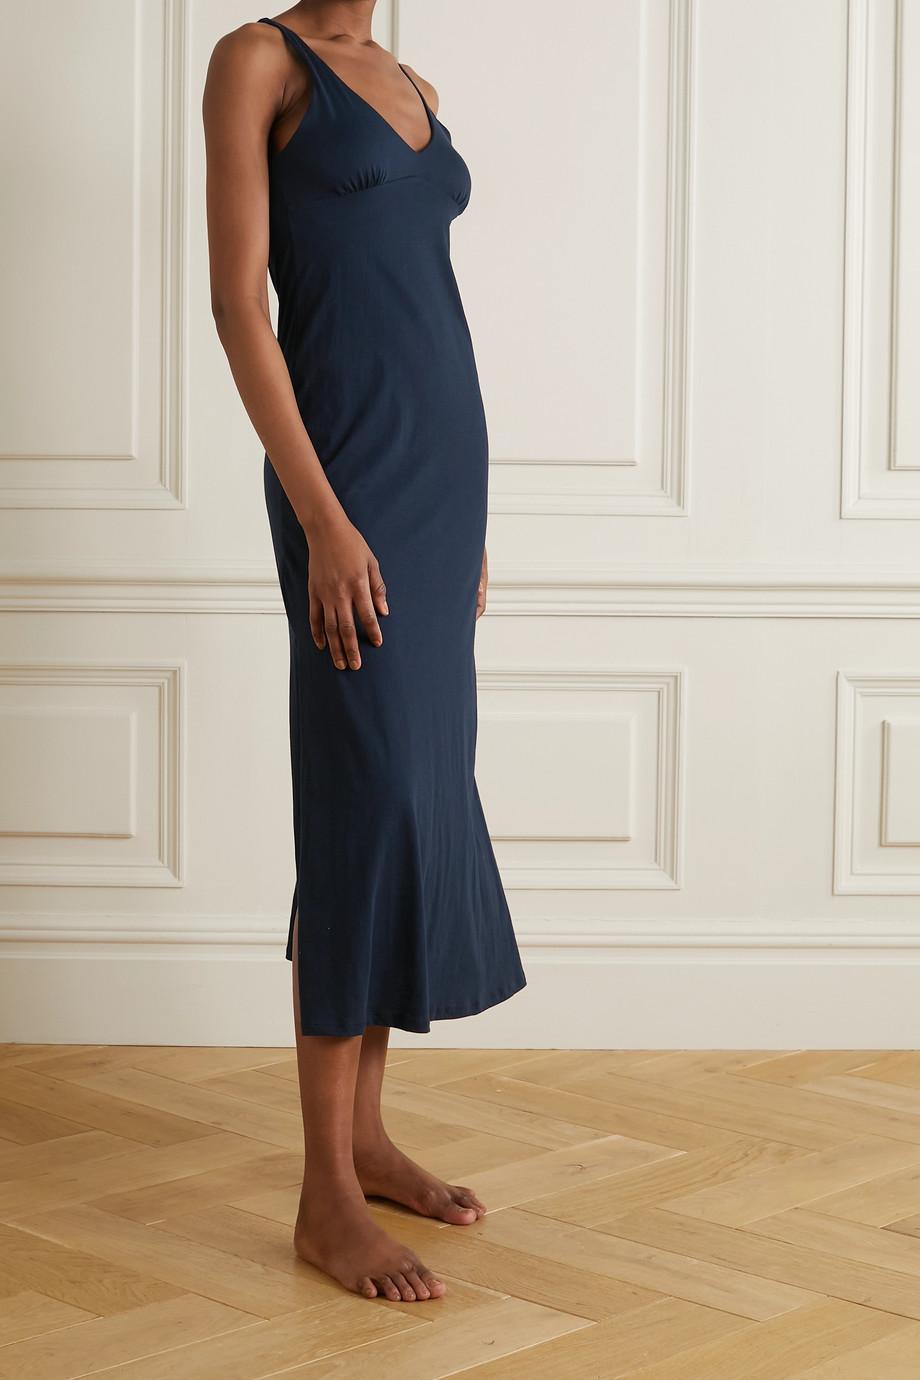 Skin + NET SUSTAIN Karina organic Pima cotton-jersey nightdress